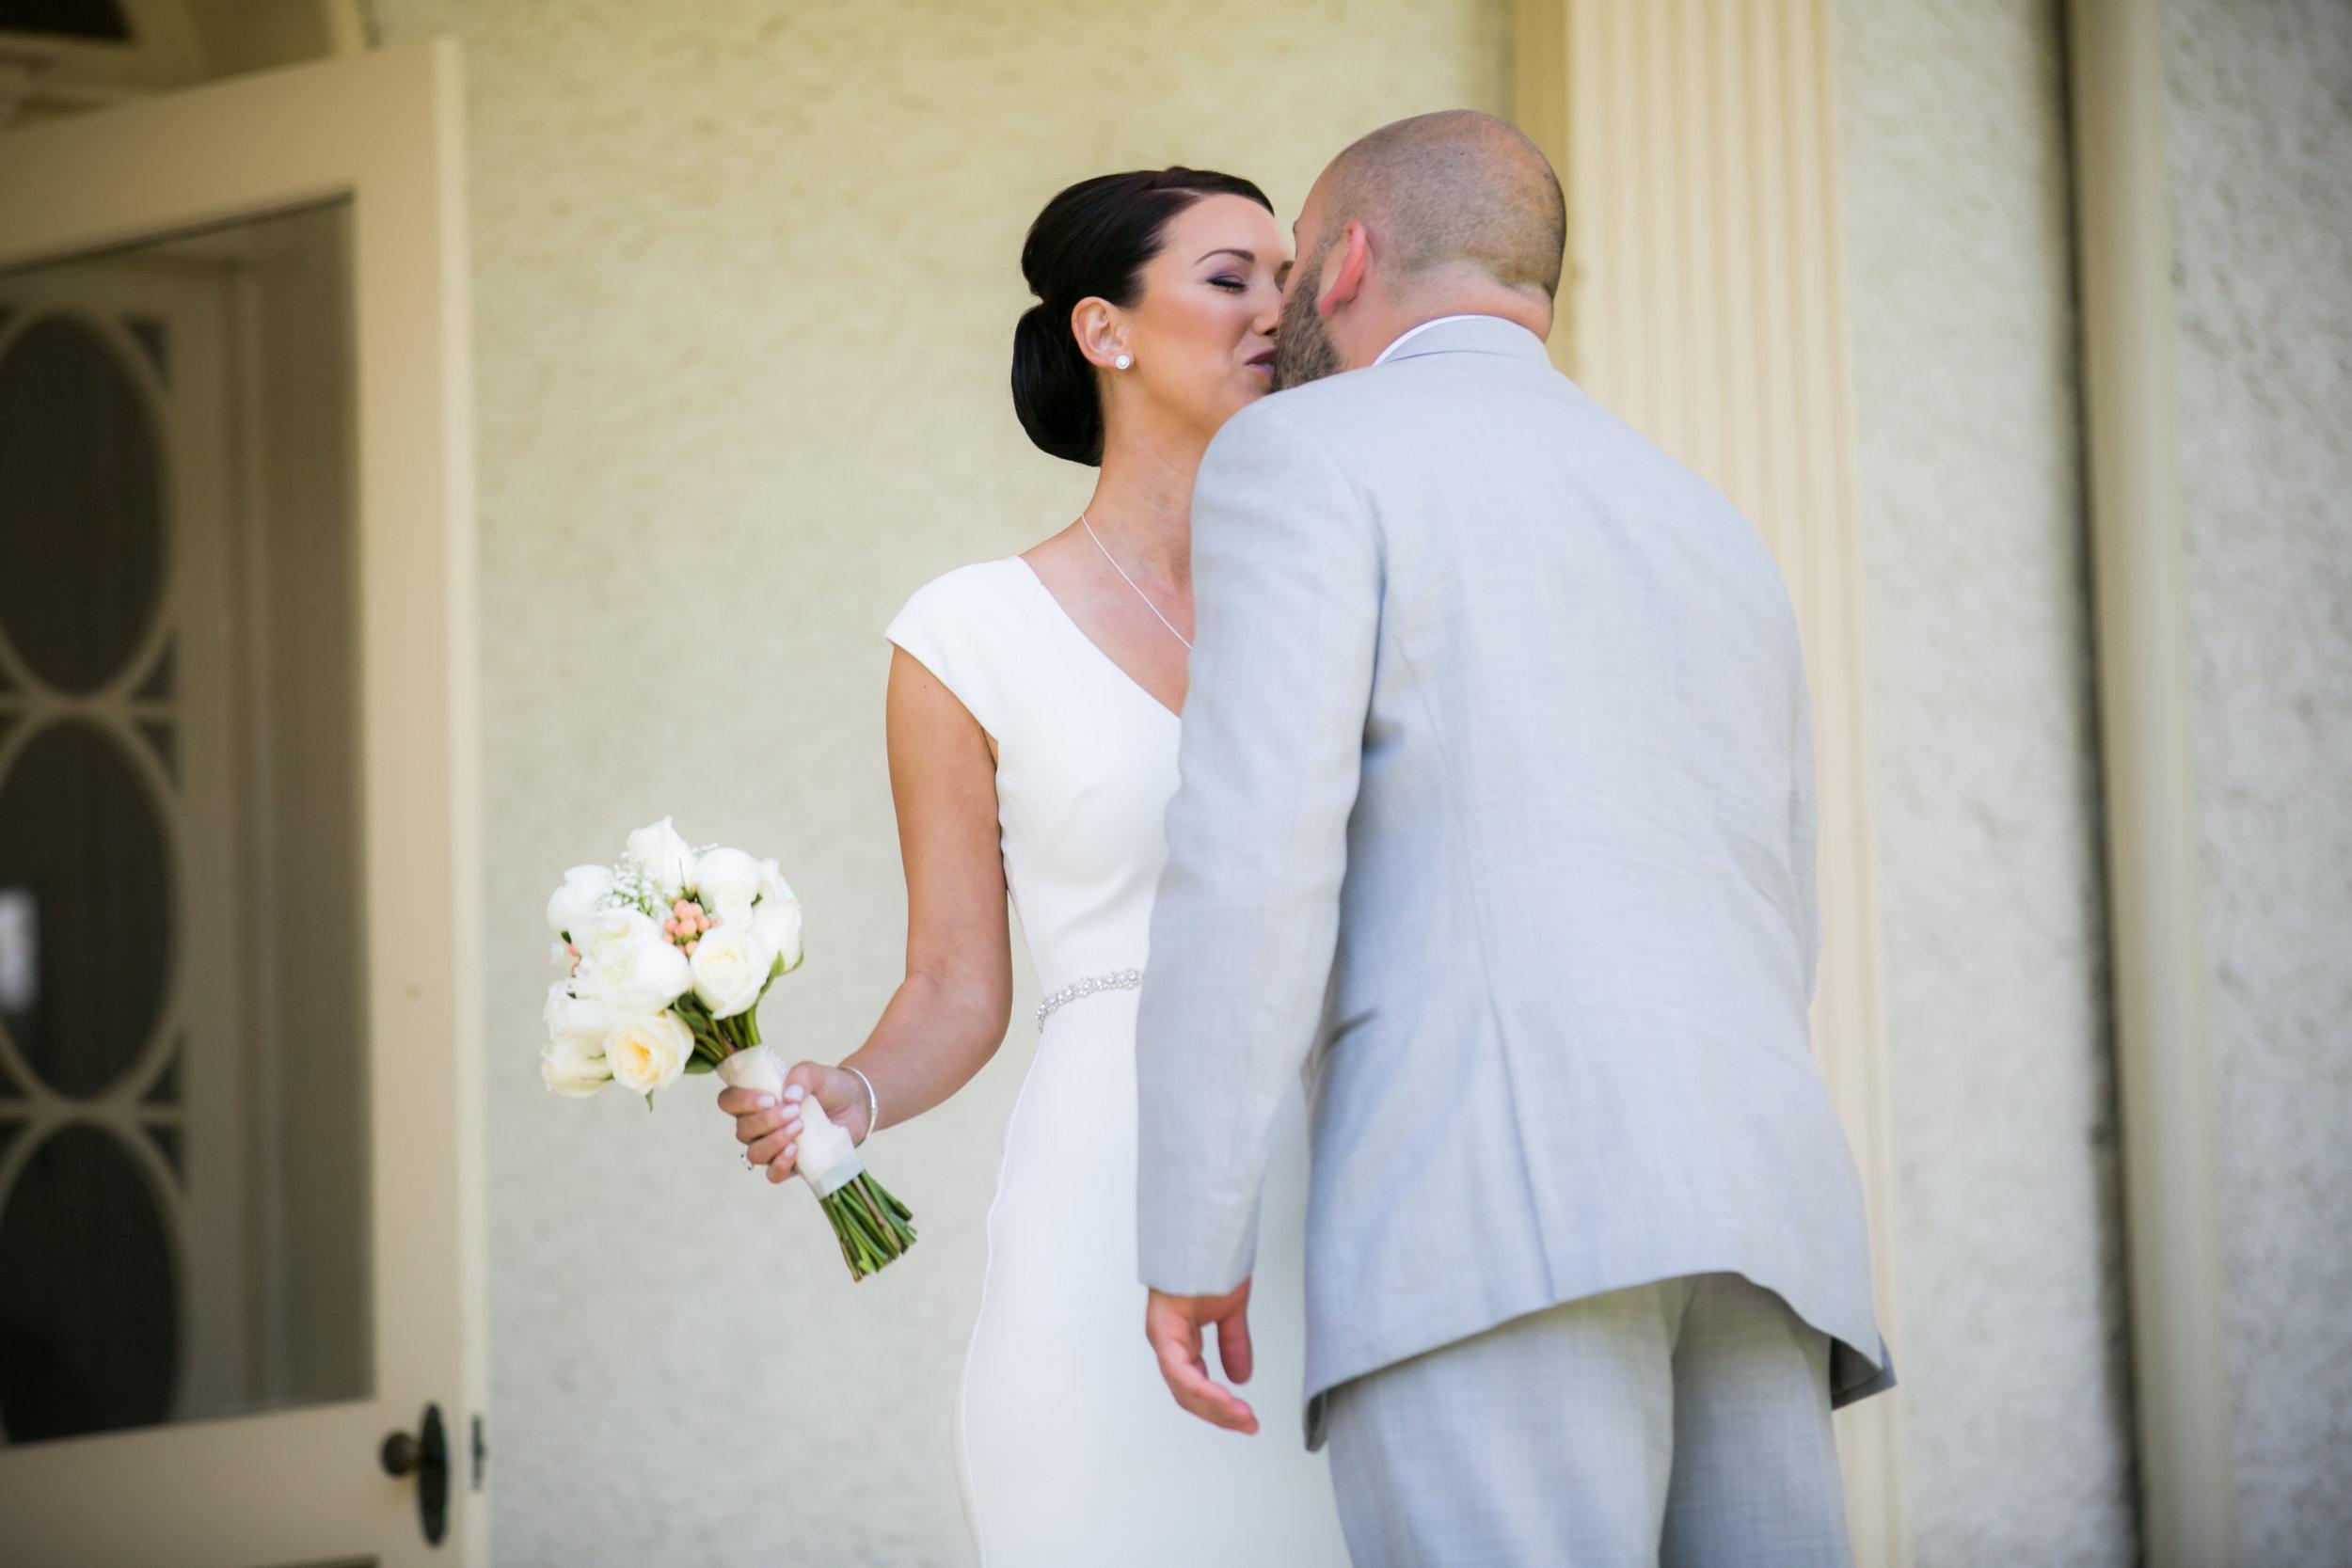 Pure elegance events Tynise Kee dc wedding planner va wedding planner rust manor house leesburg -0013.jpg